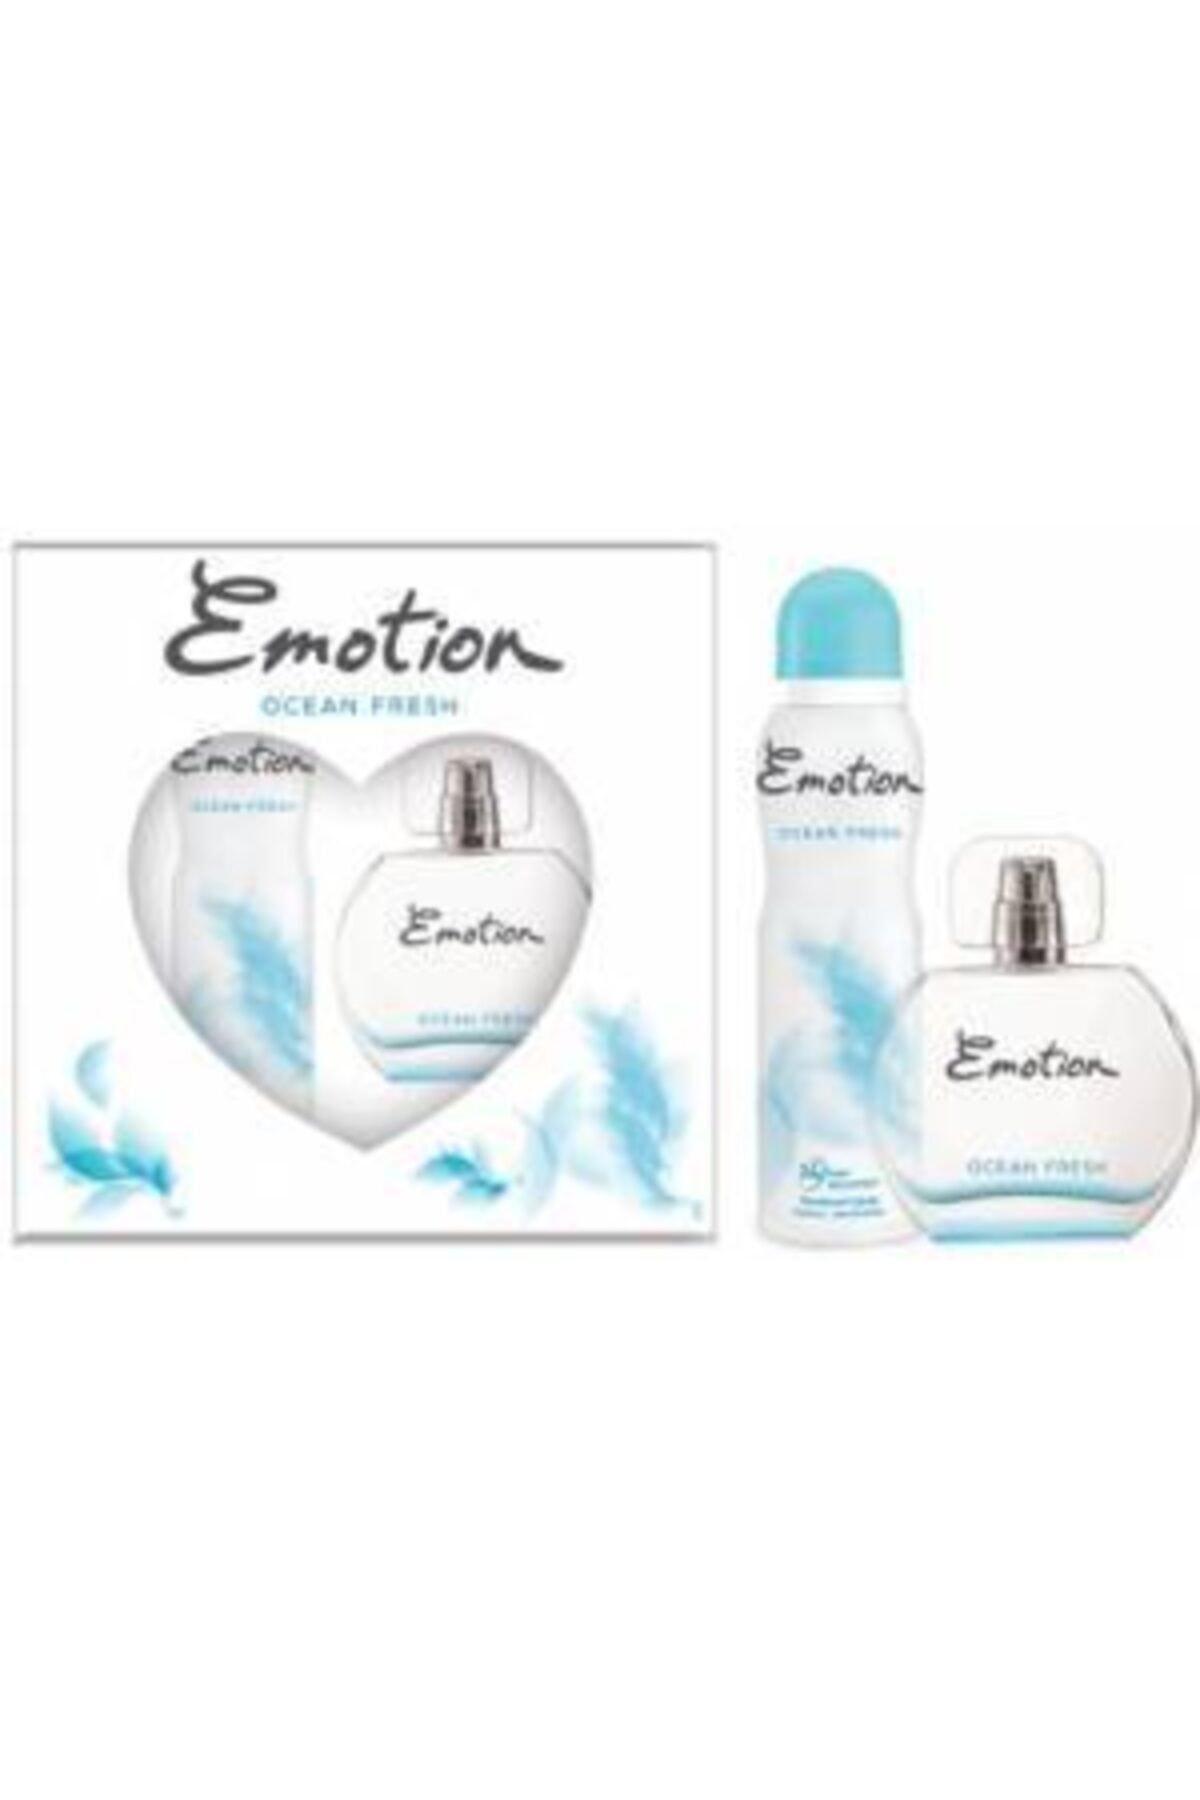 Emotion Ocean Fresh Bayan Edt 50 Ml + 150 Ml Deodorant Parfüm Seti 1